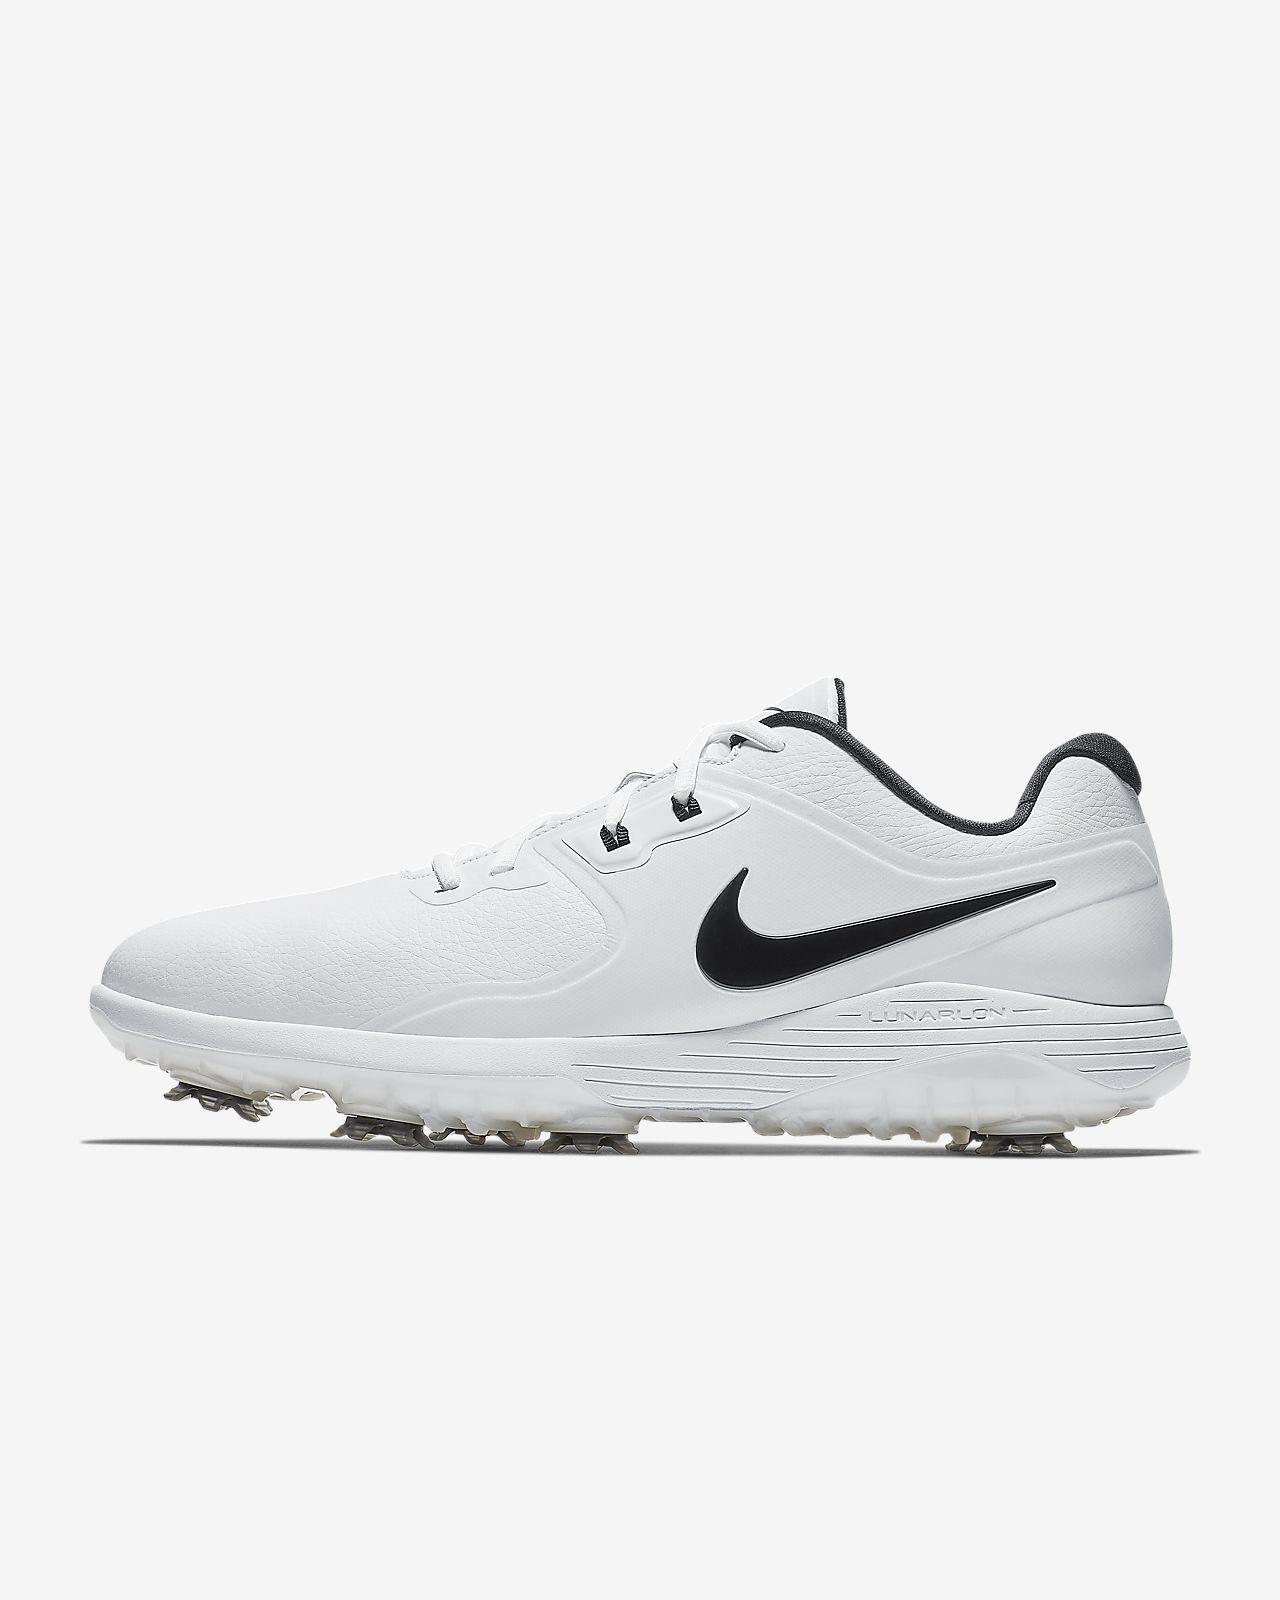 hot sale online 911e8 4e48a ... Nike Vapor Pro Mens Golf Shoe